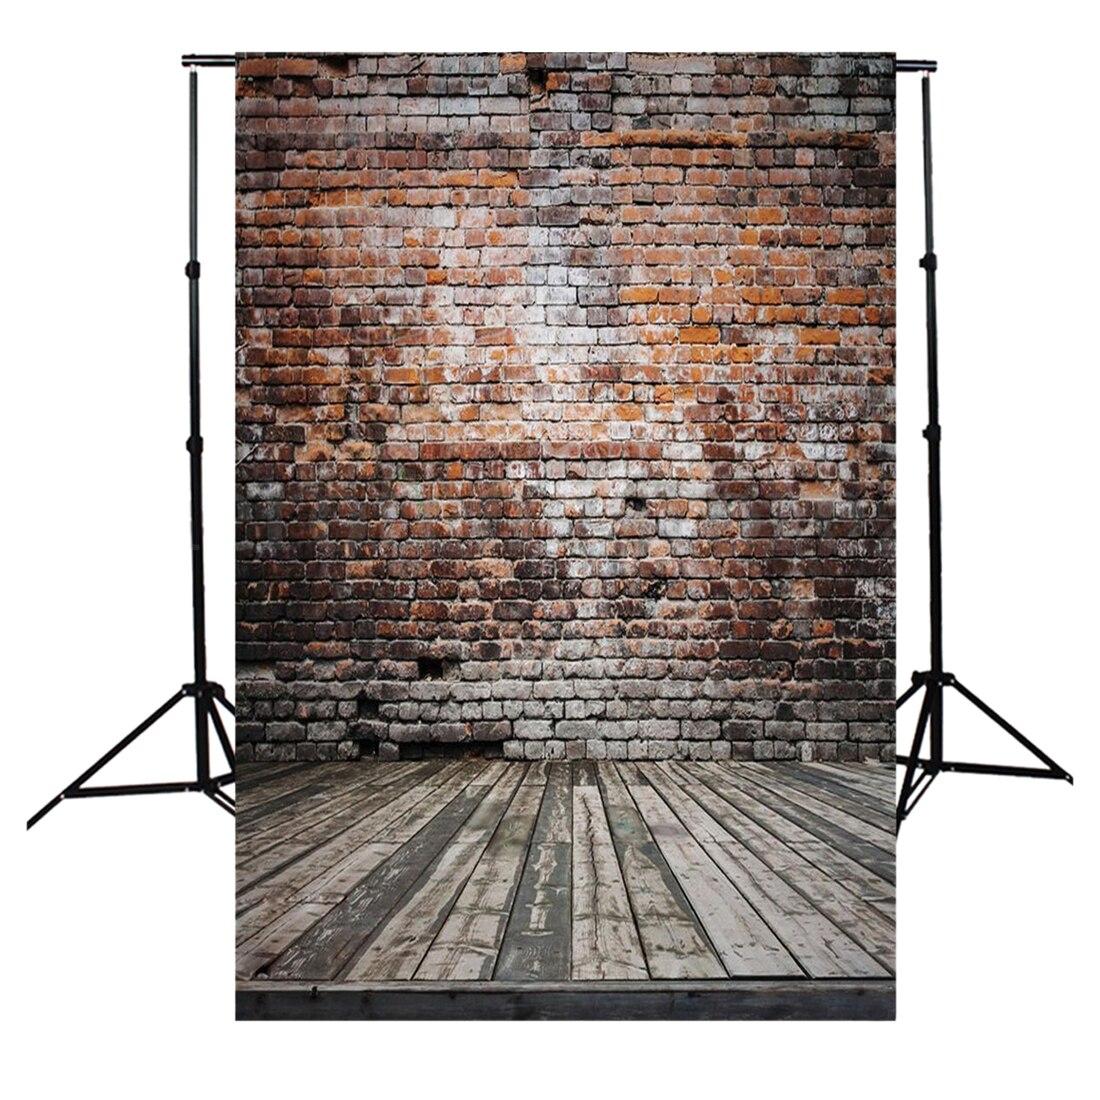 5x7FT Vinyl Photography Backdrop Photo Background, Old brick wall wood floor 10ft 20ft romantic wedding backdrop f 894 fabric background idea wood floor digital photography backdrop for picture taking